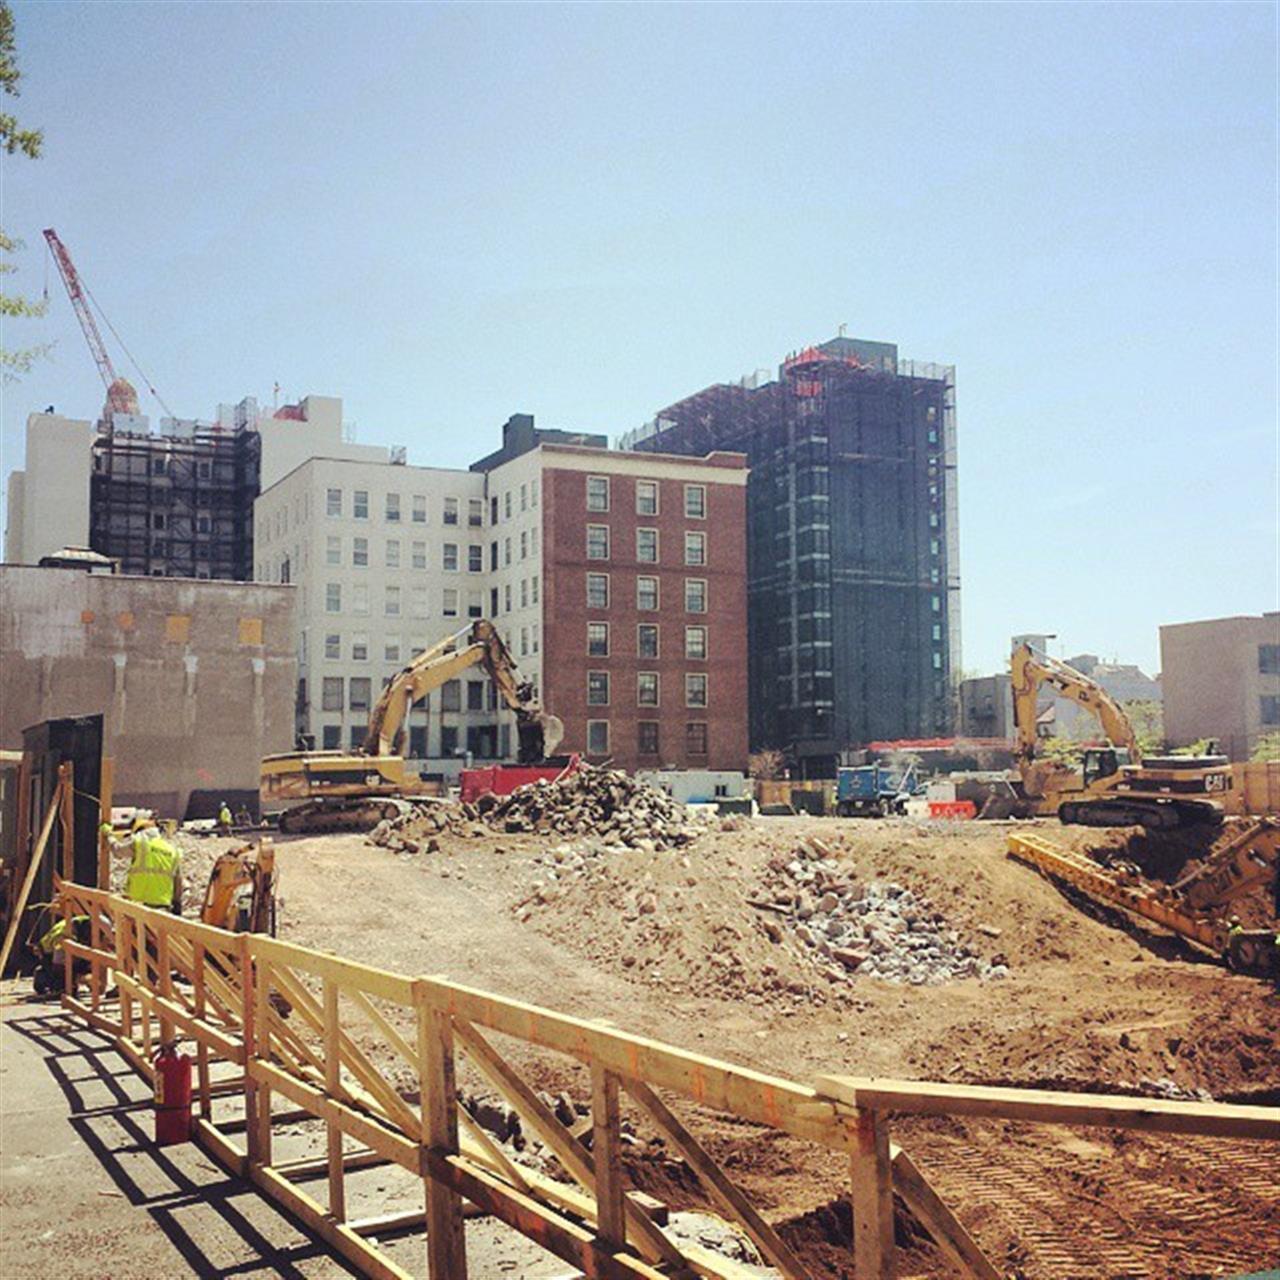 Construction site on Pacific Street #nyc #newyork #brooklyn #usa #construction #architecture #city #bkoriginal #leadingRElocal